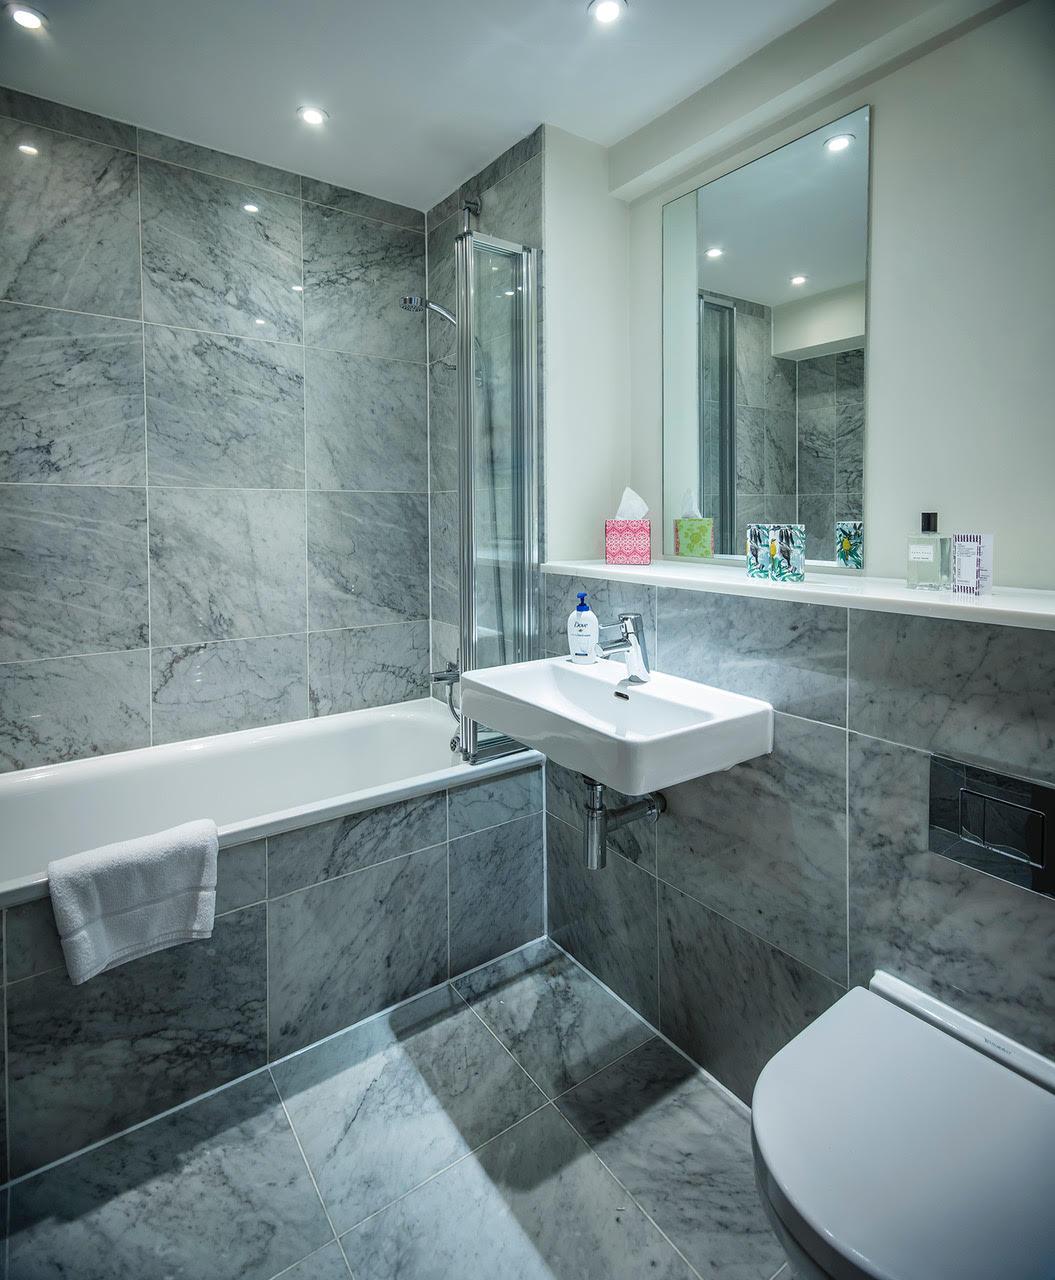 Mayfair 3 Bedroom Fabulous Luxury Suite photo 13782178